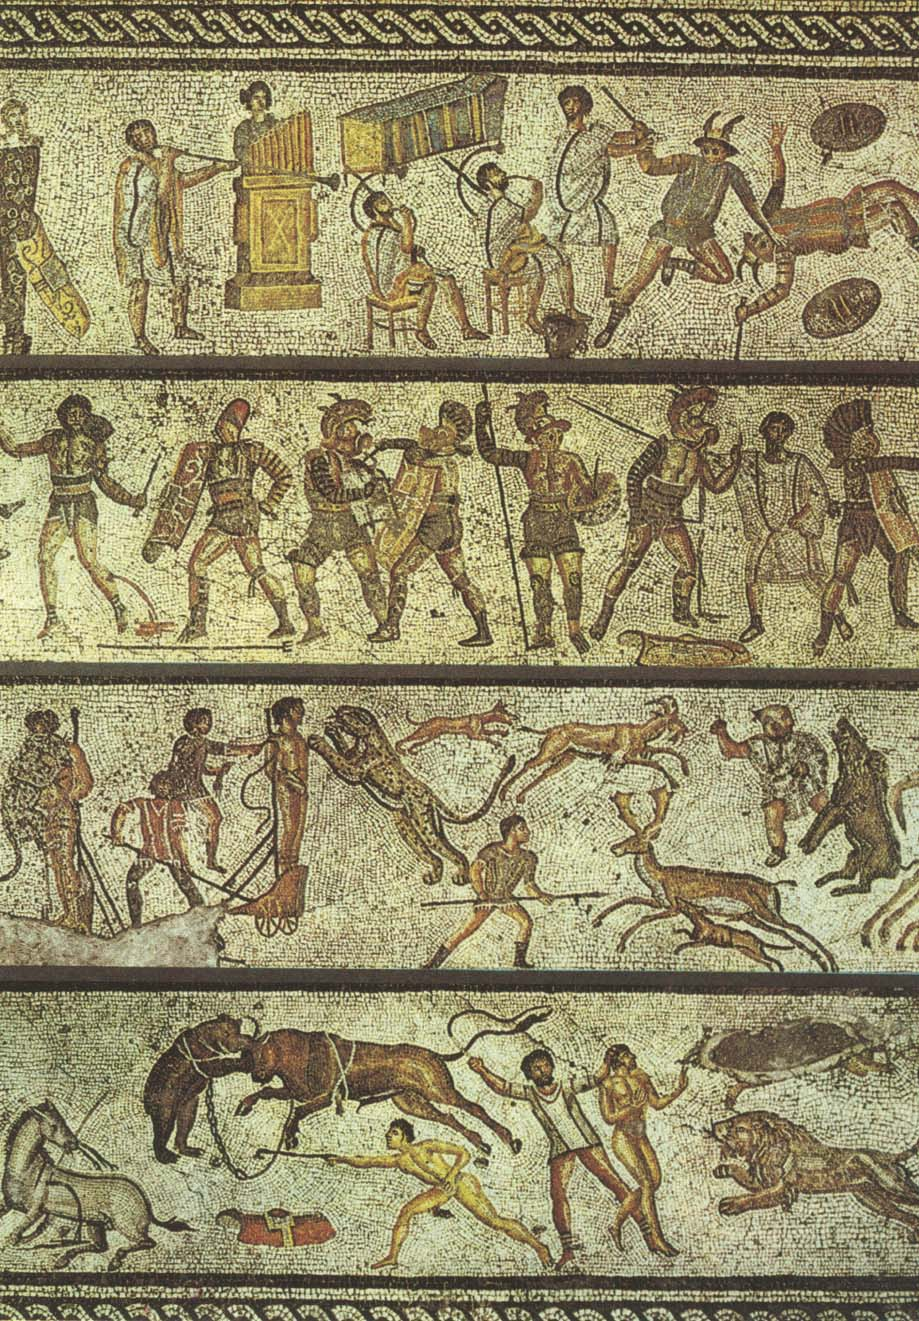 1 500 Years Later Killer Animal Elevator Returns To